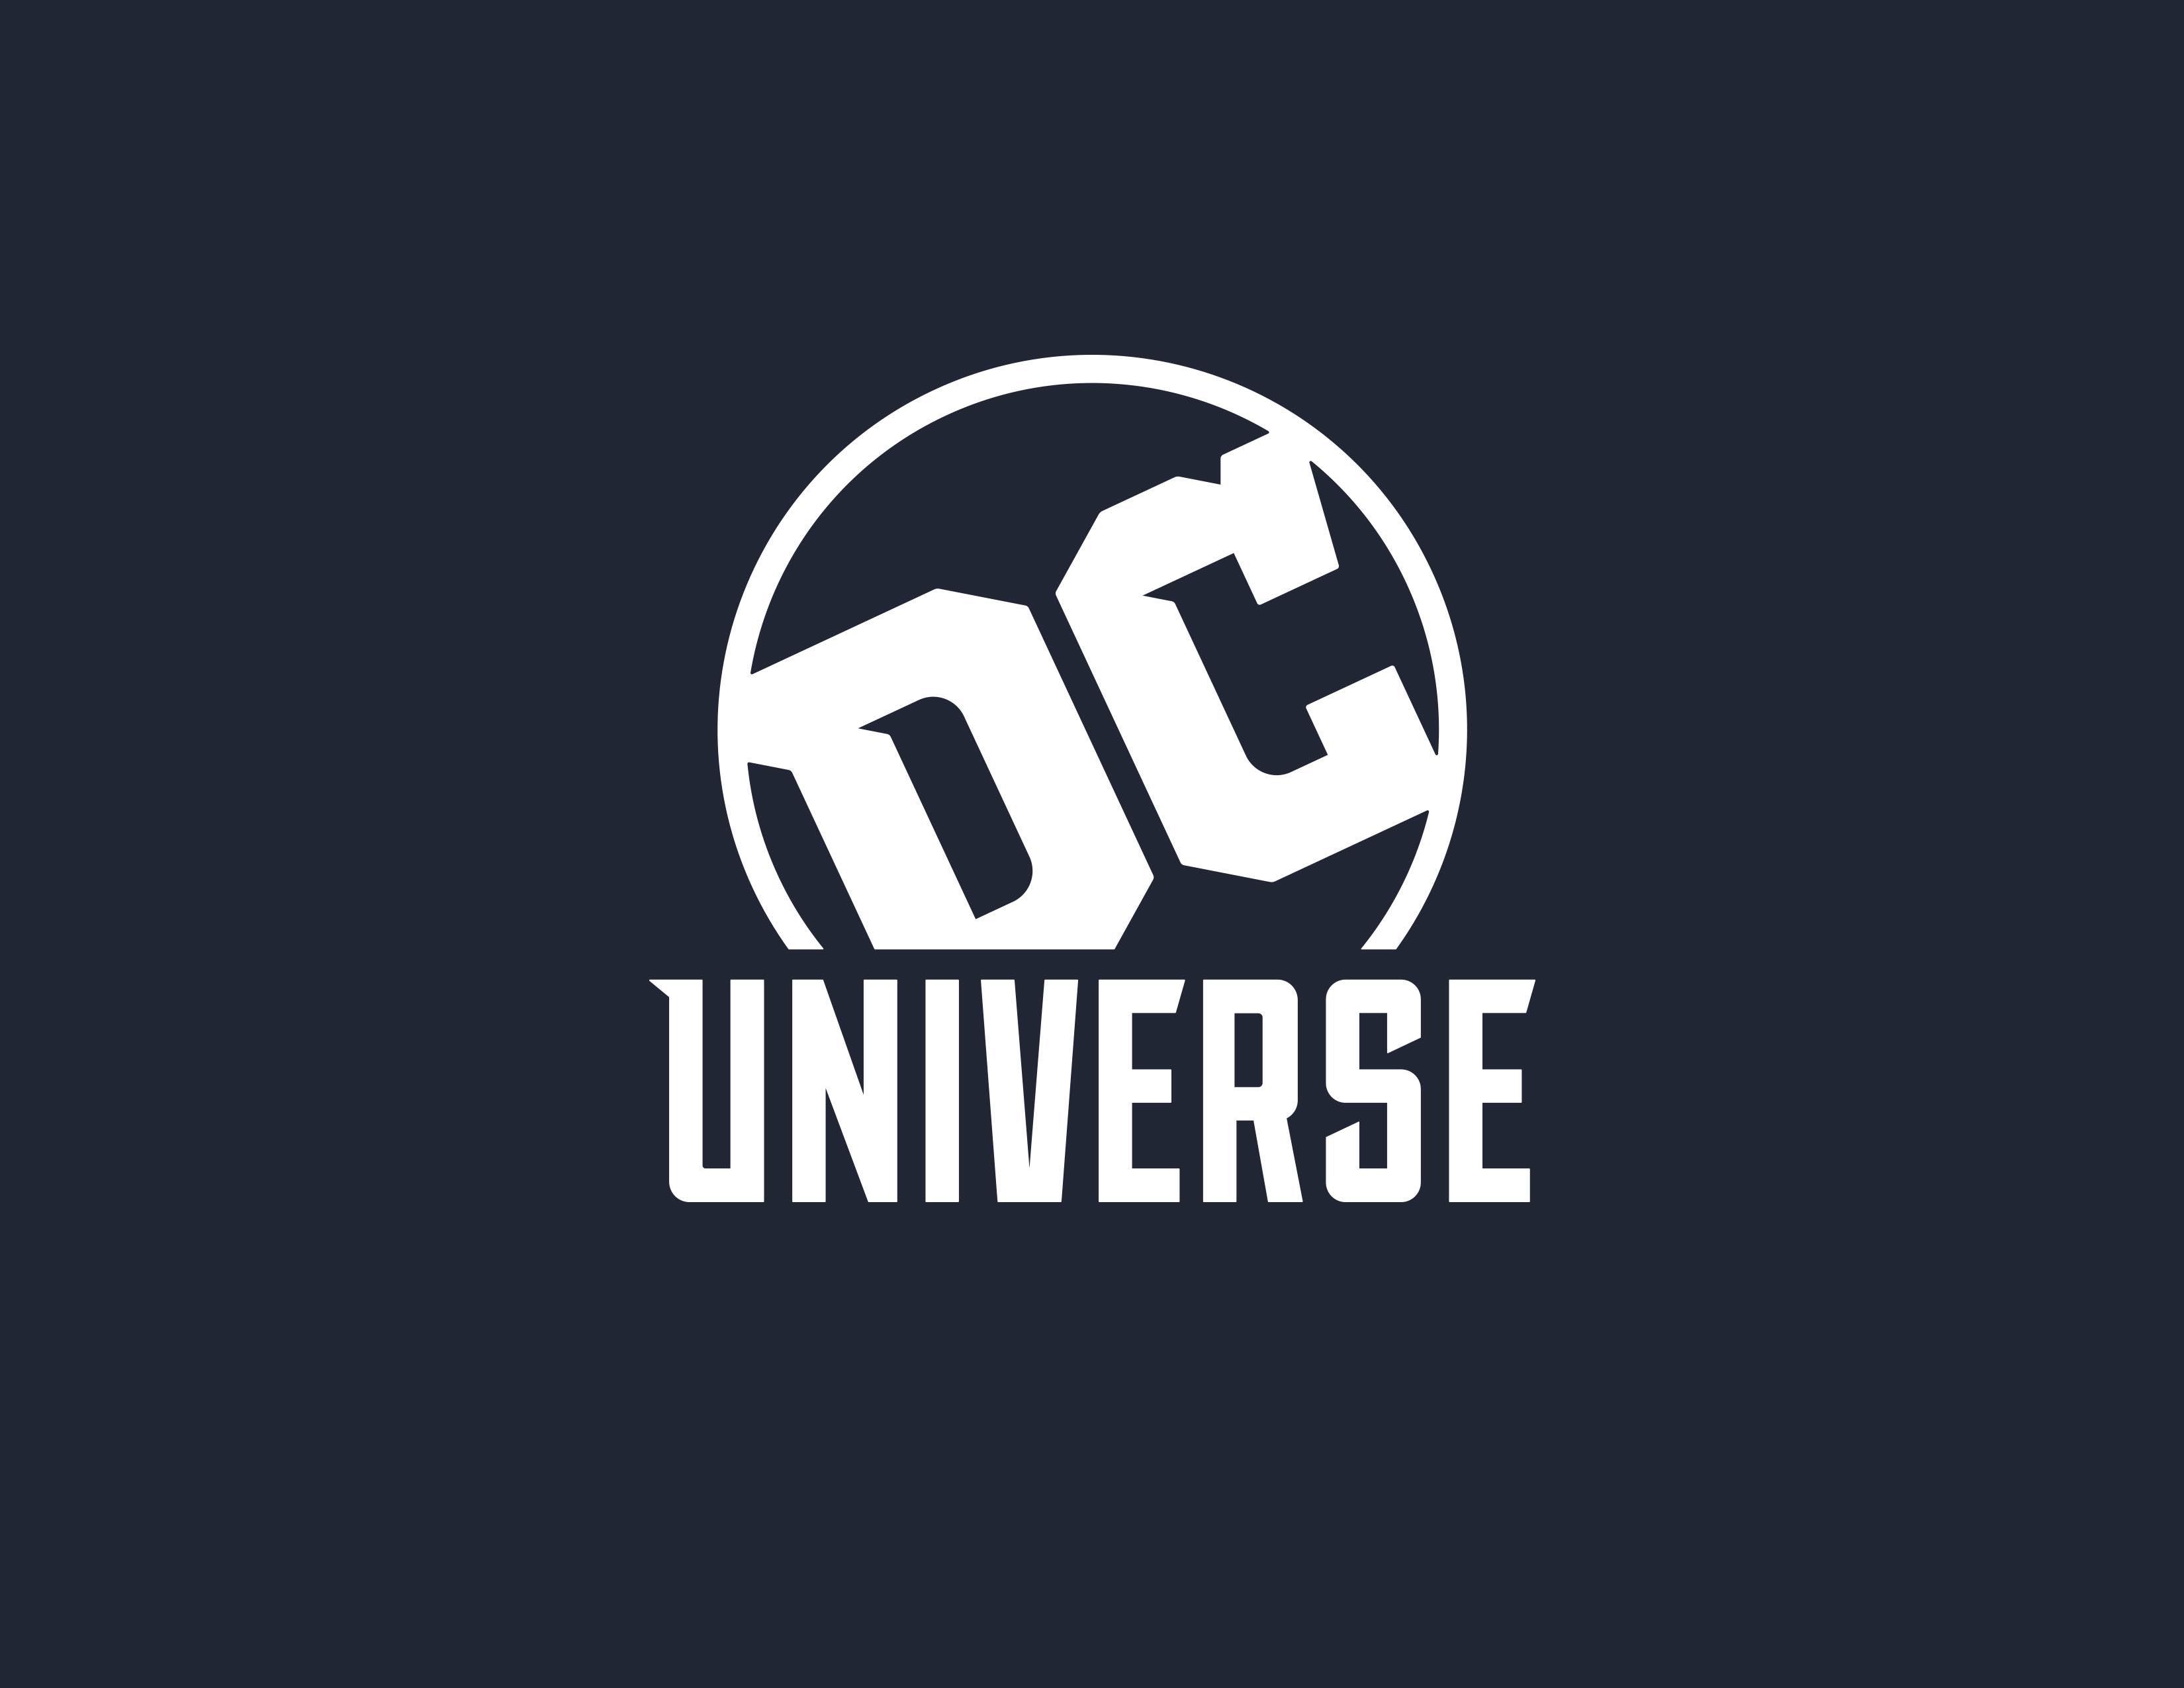 DC Universe 21000 Comics, DC Universe Doubling Comic Book Library, DC Univese